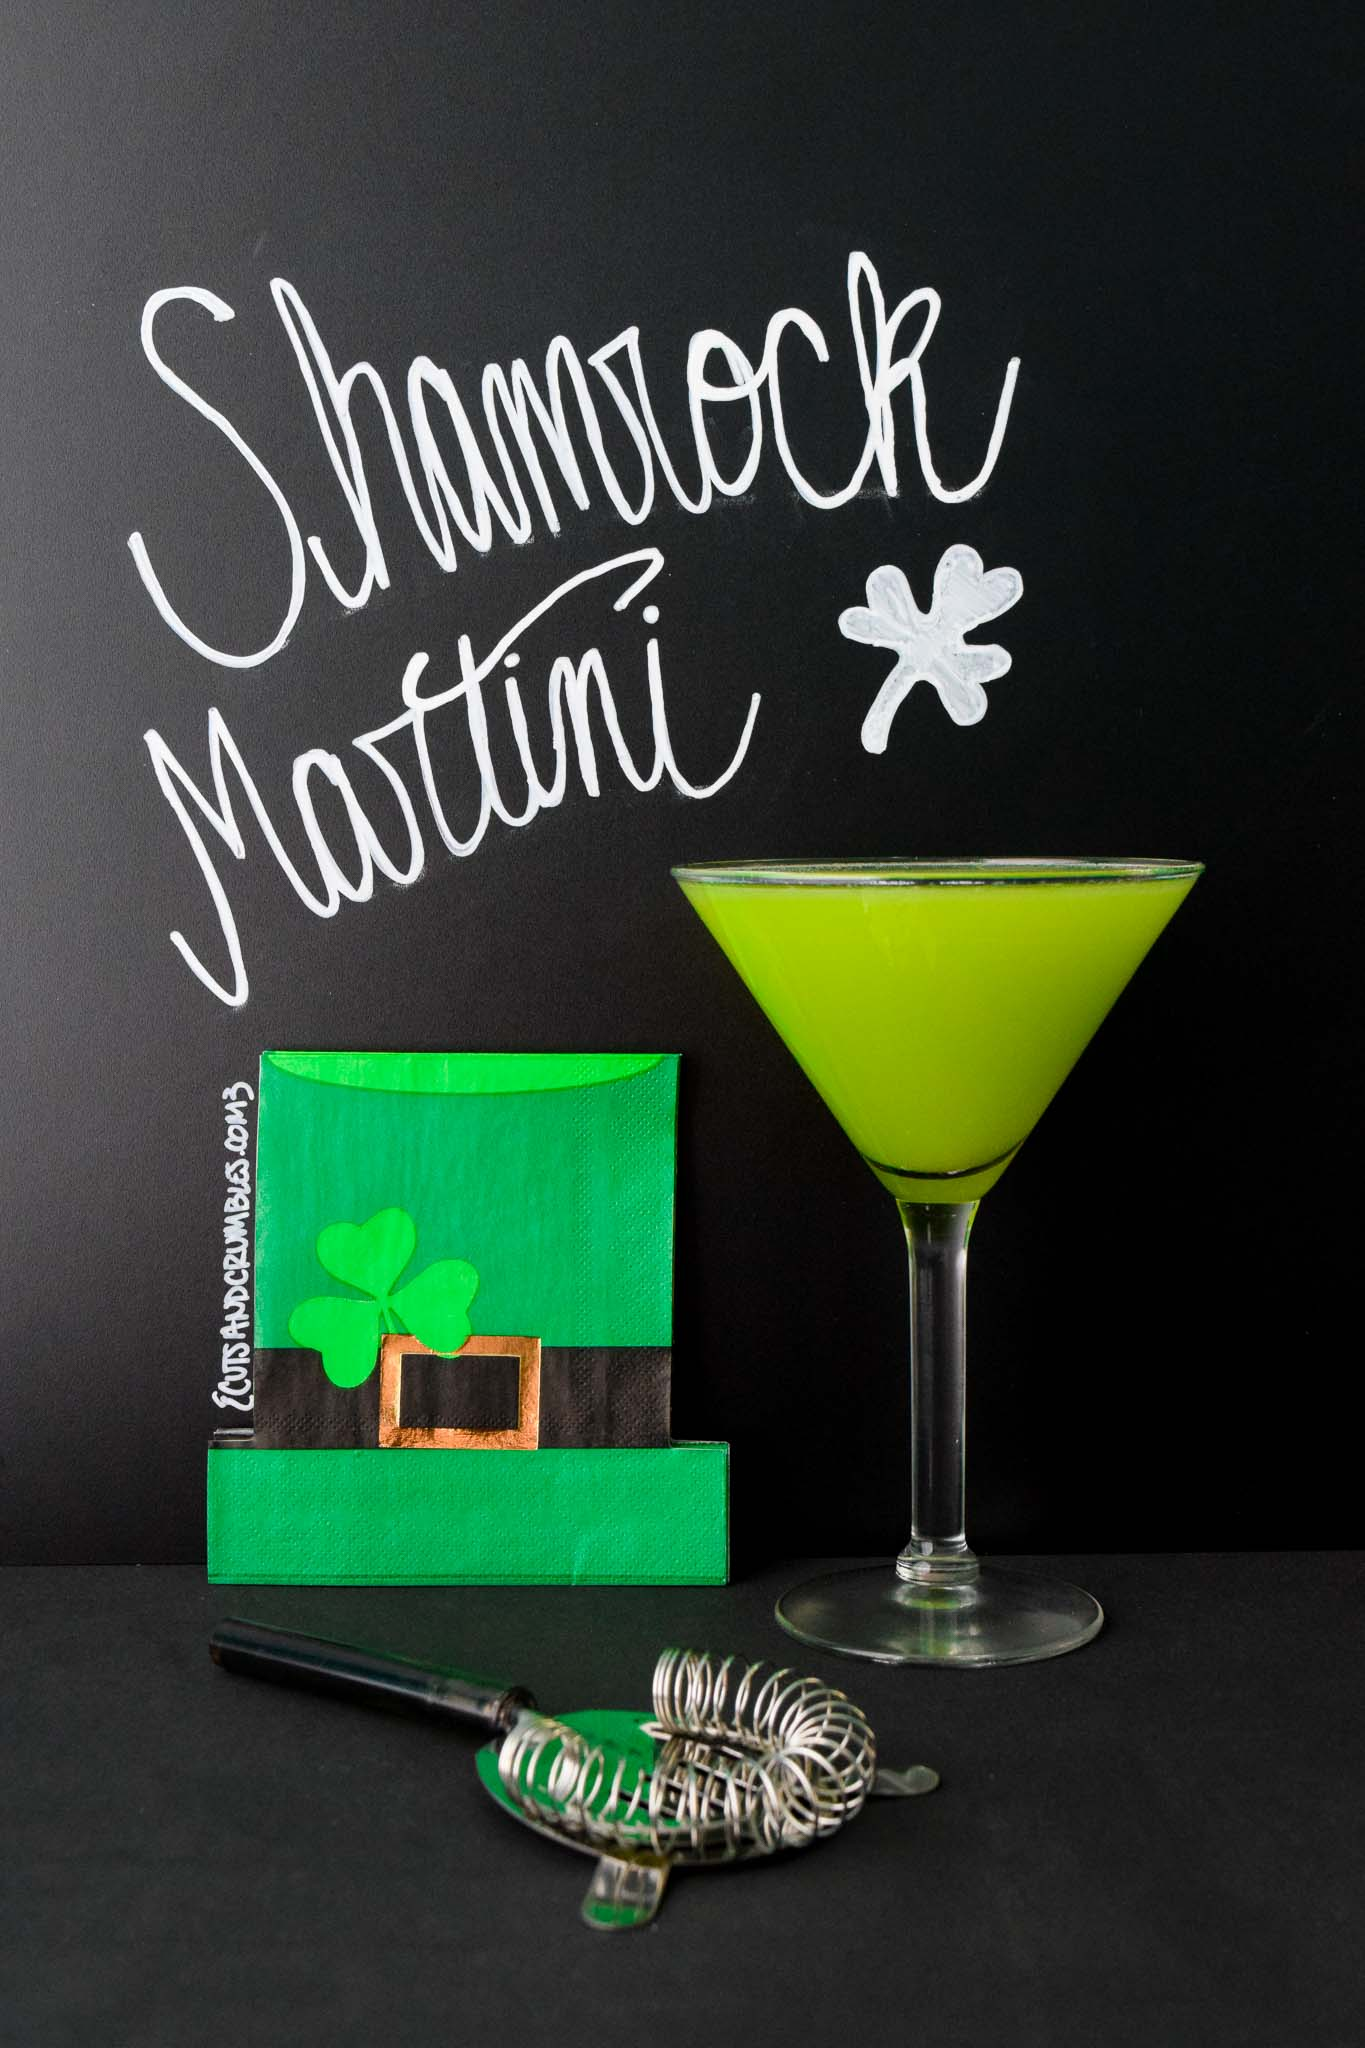 shamrock martini with title written on chalkboard